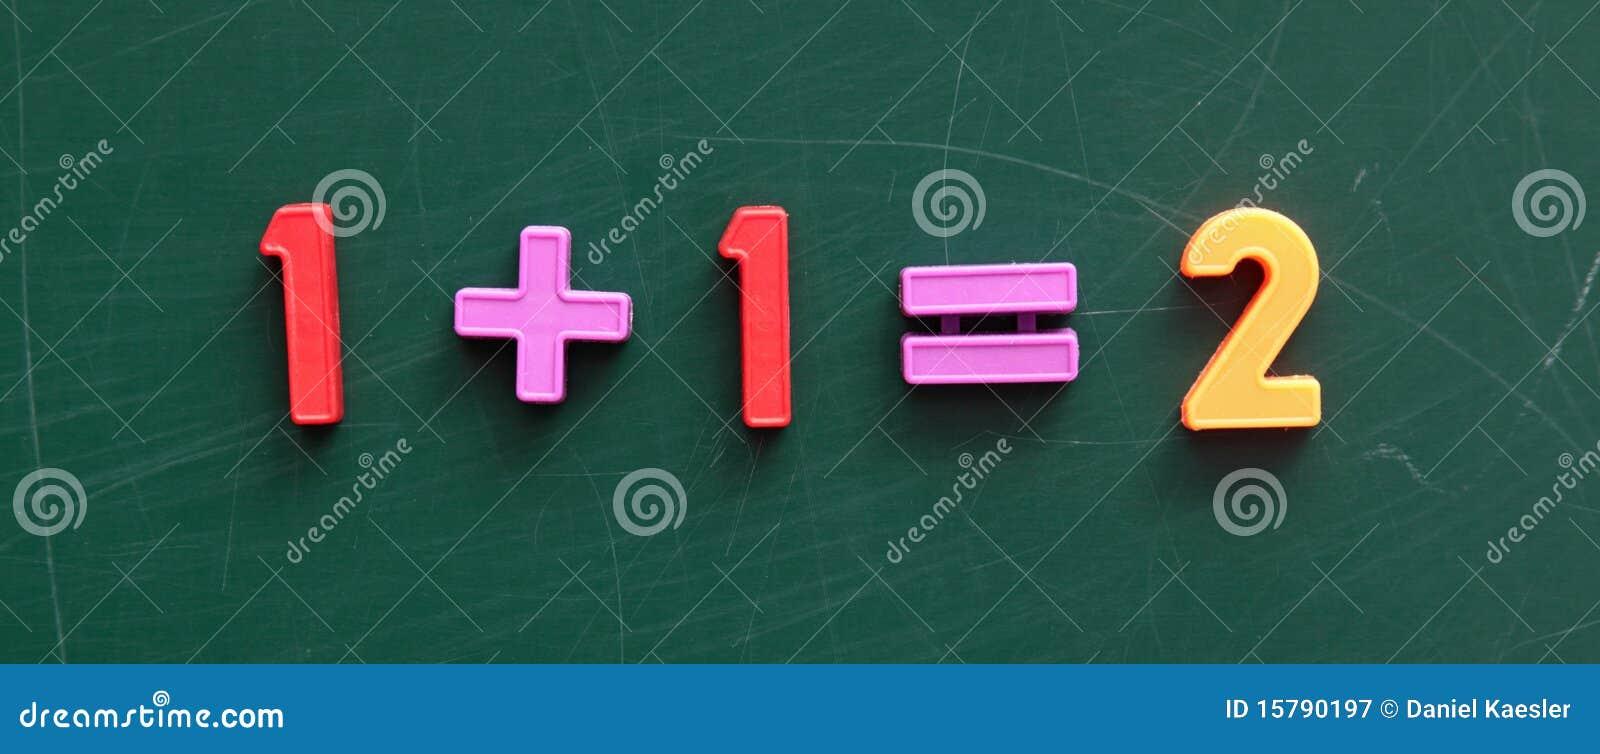 Basic Arithmetic Operations Royalty Free Stock Photography - Image ...